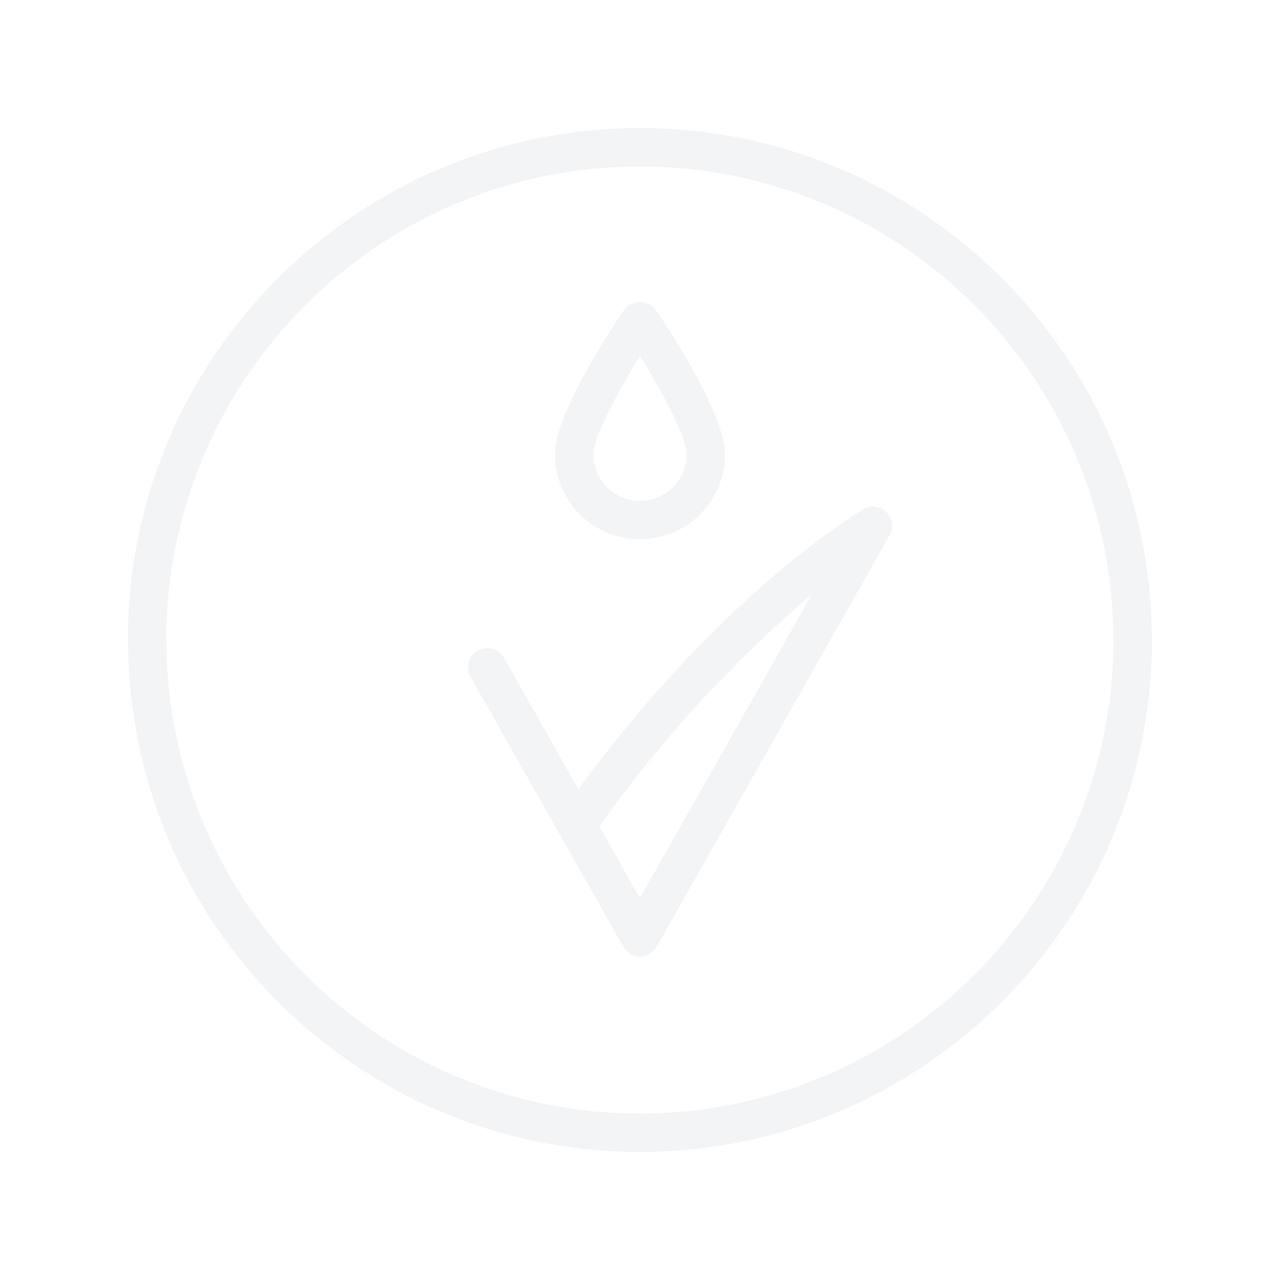 ARTDECO Lash Booster Volumizing Mascara Base 10ml